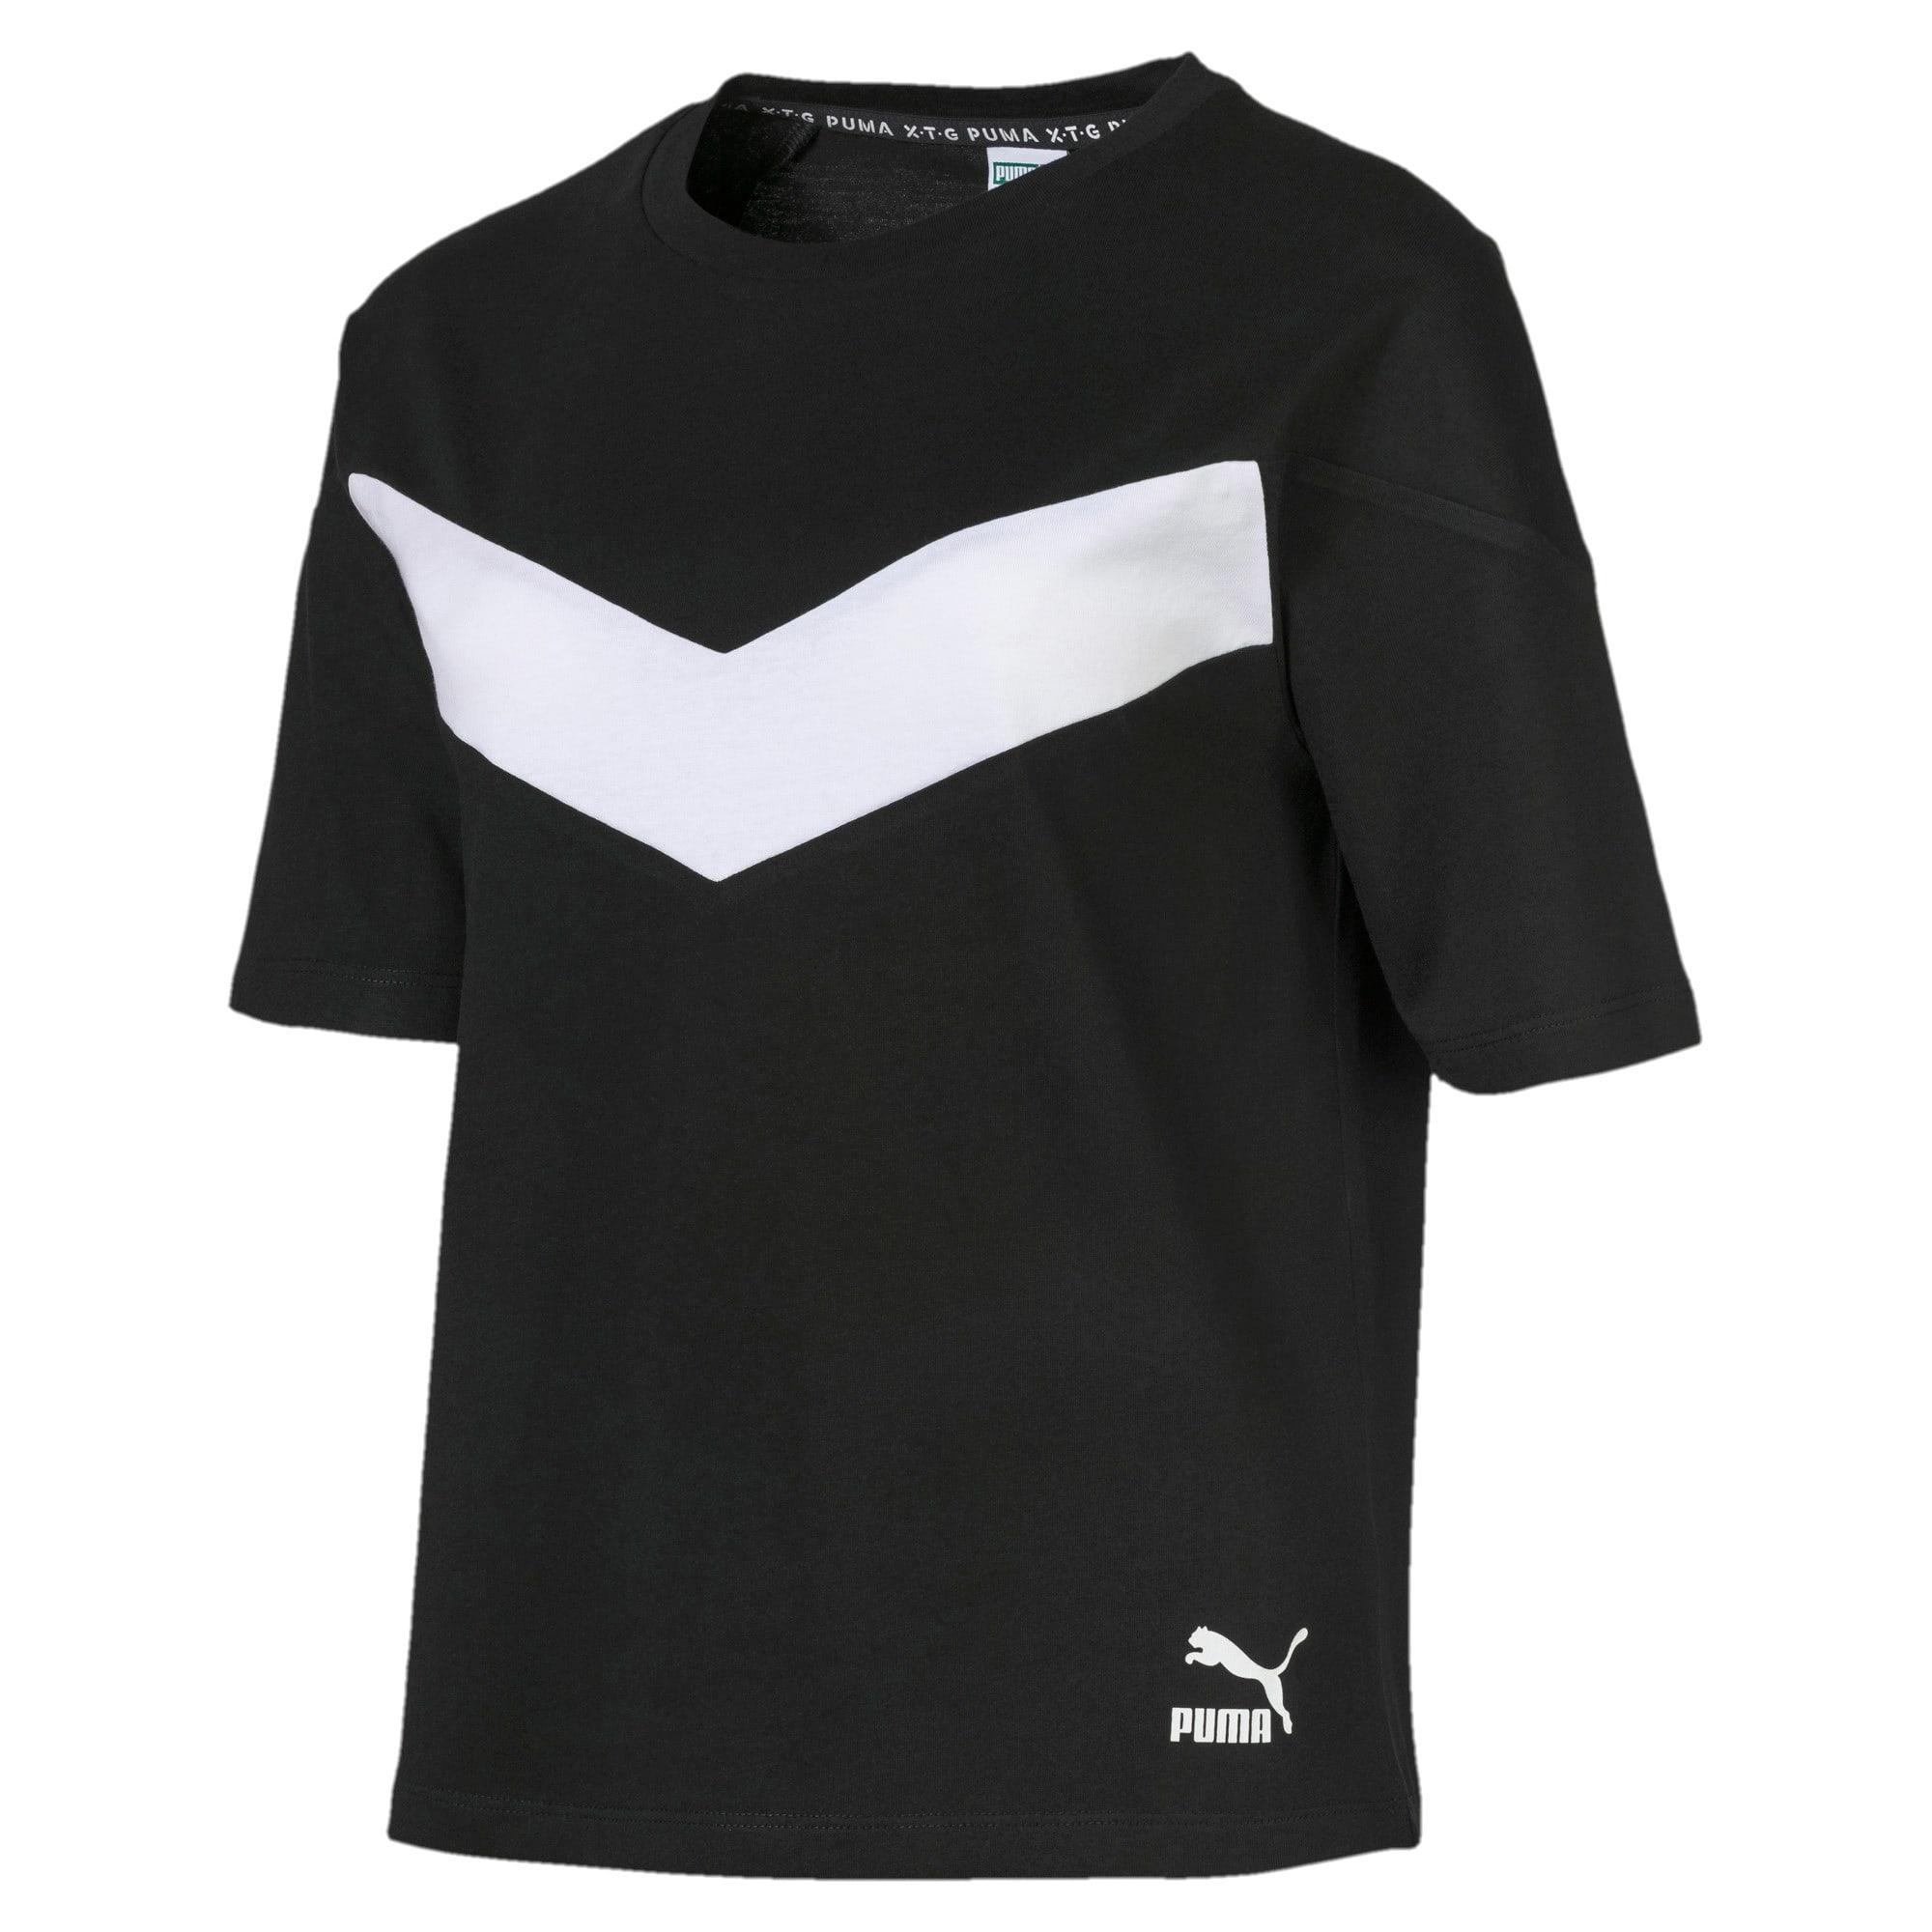 Thumbnail 4 of プーマ XTG ウィメンズ CB SS Tシャツ 半袖, Puma Black, medium-JPN